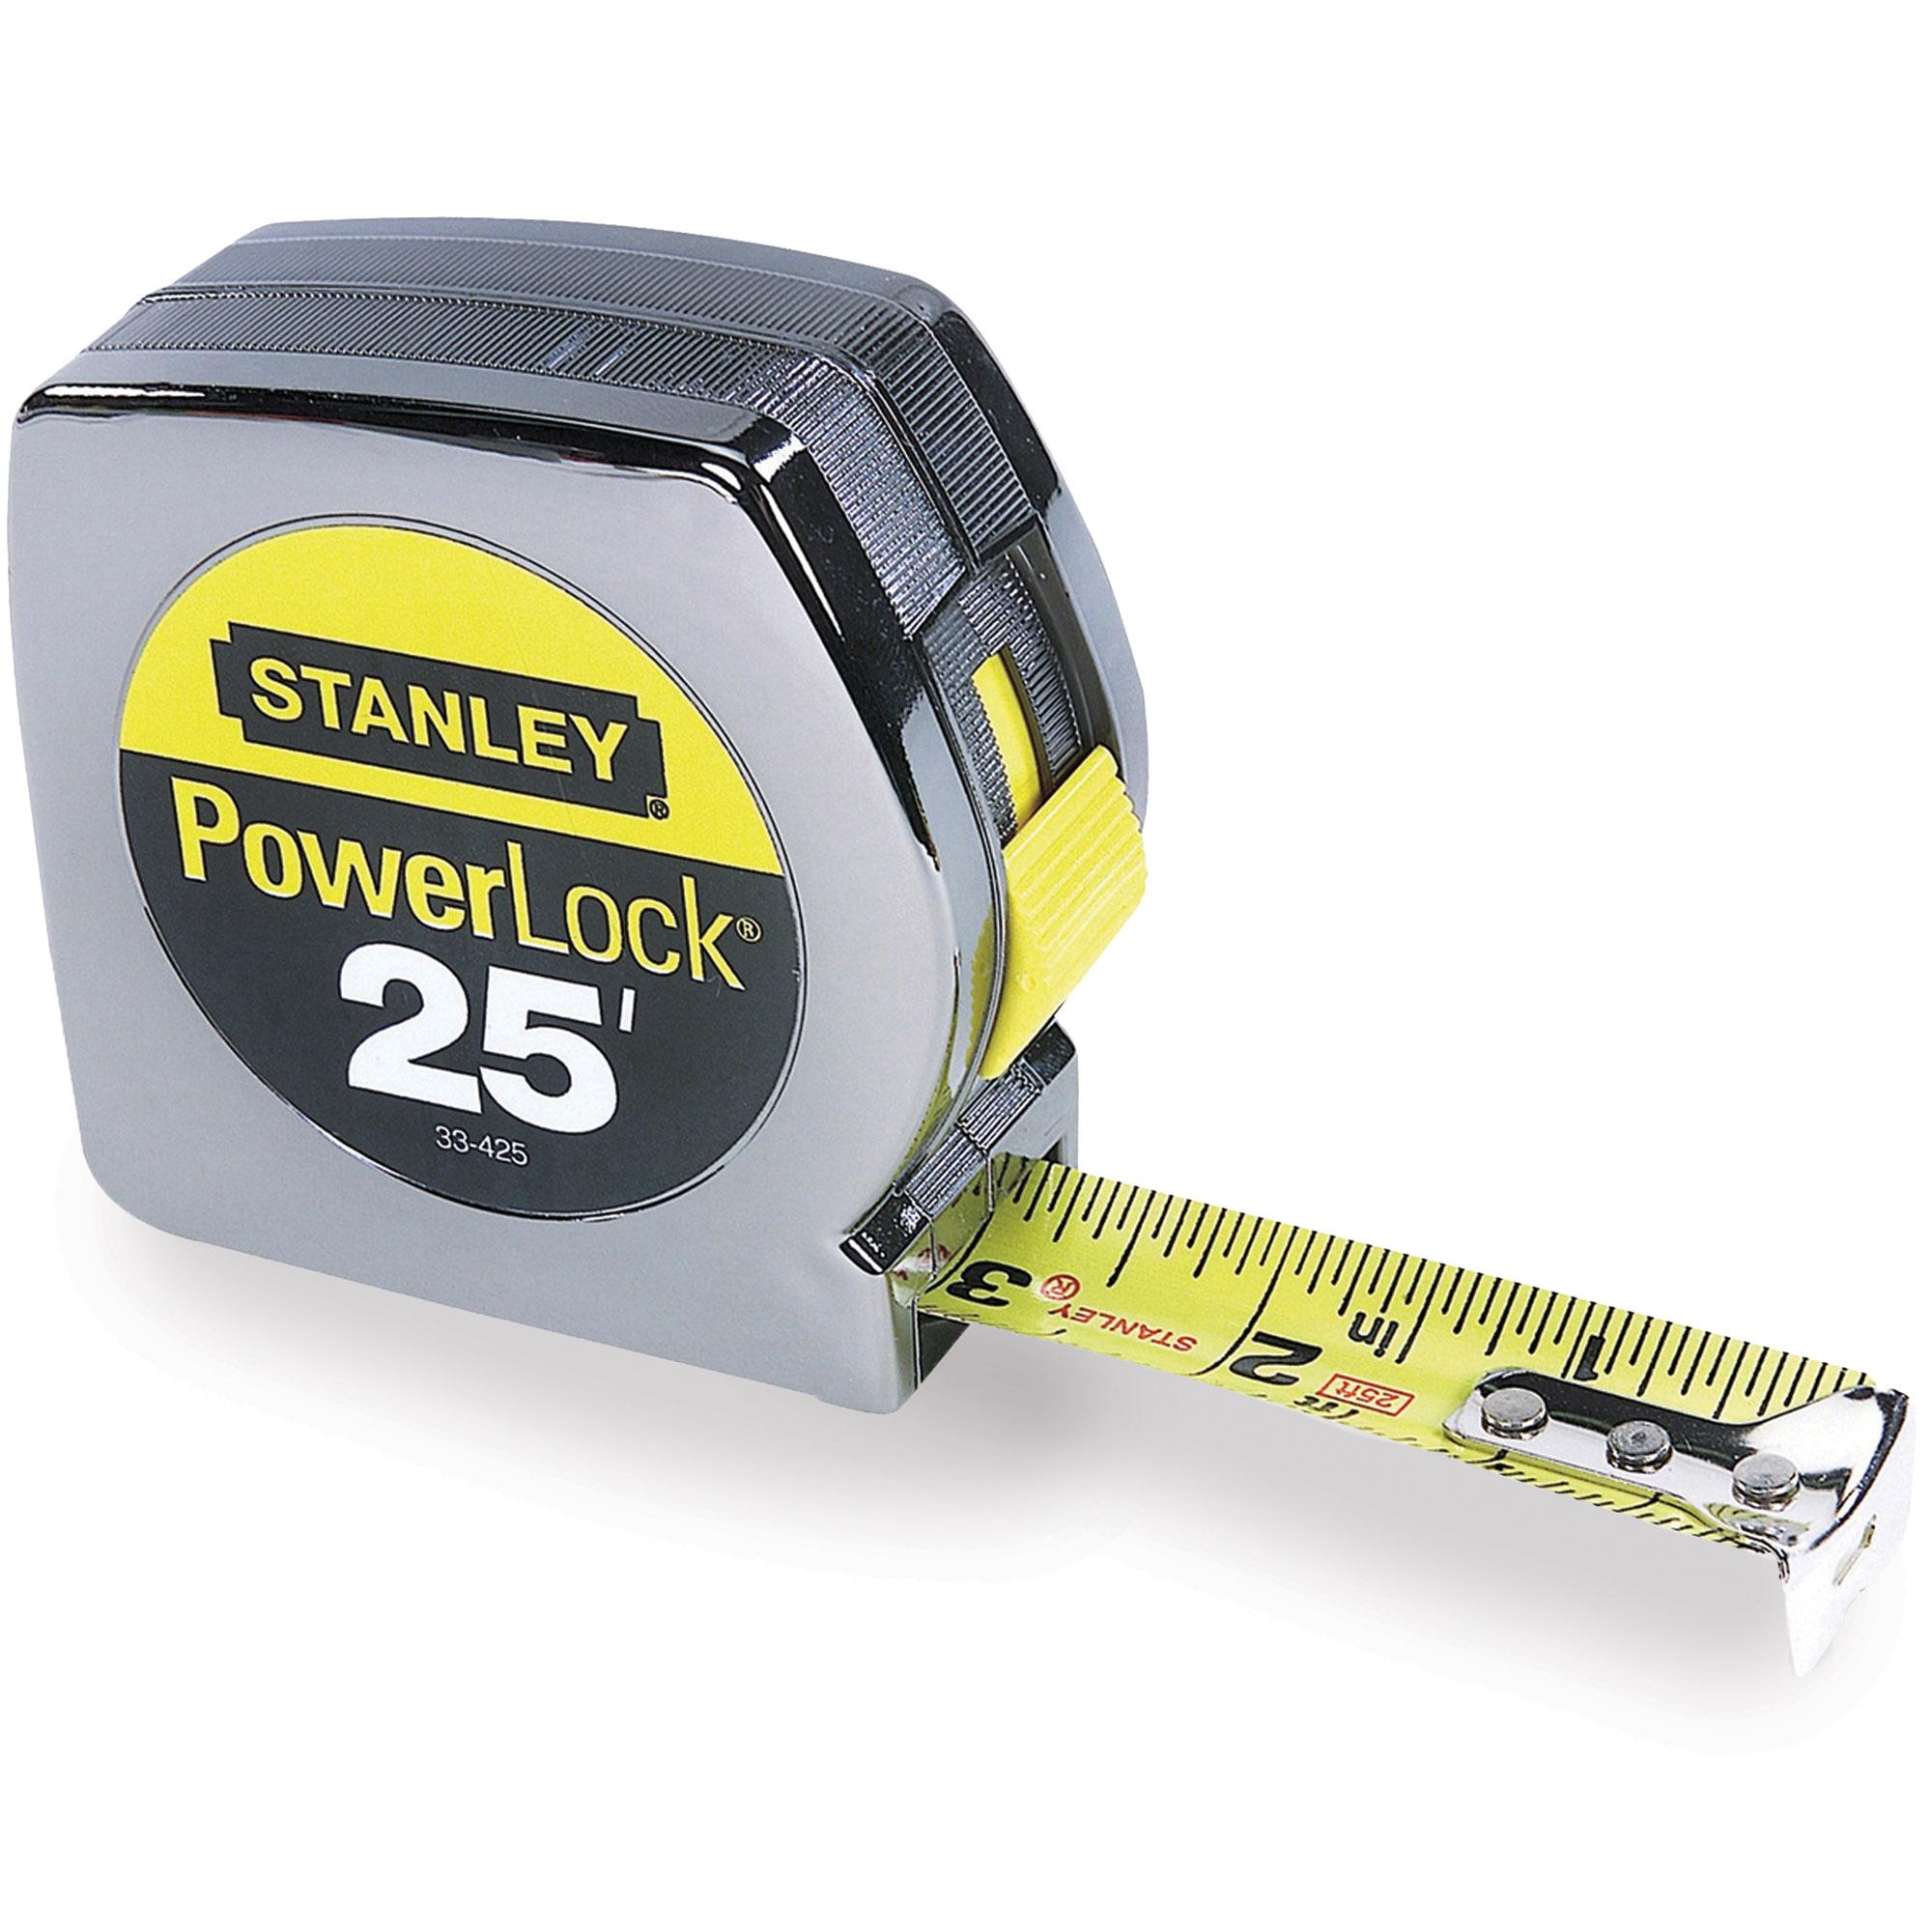 PowerLock 25, tape measure